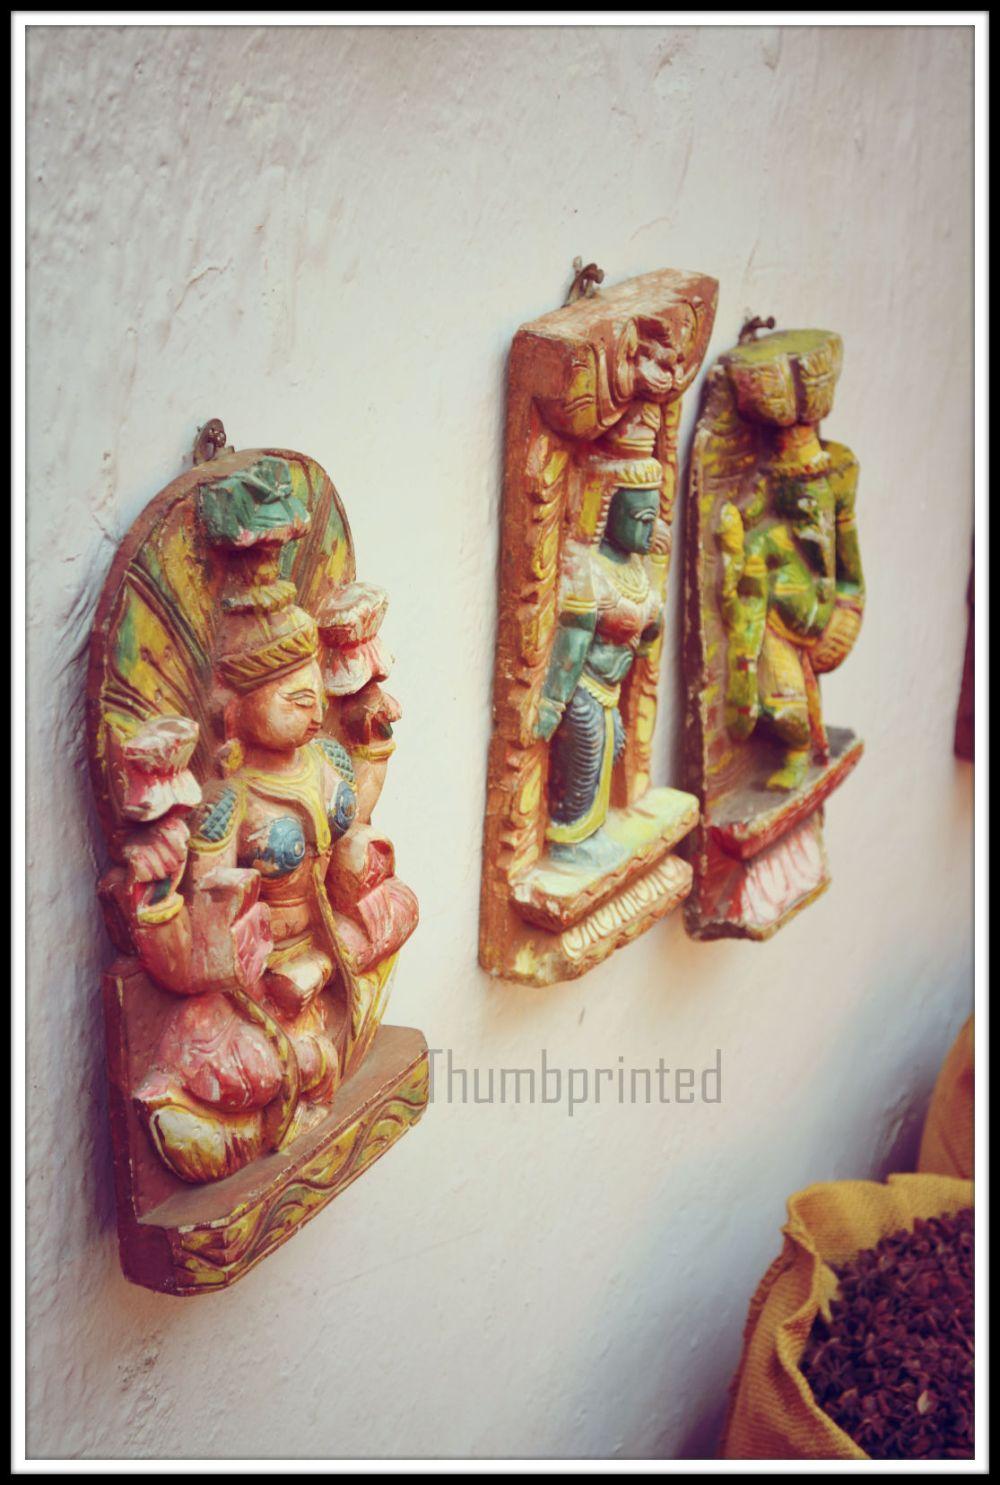 gods on the walls